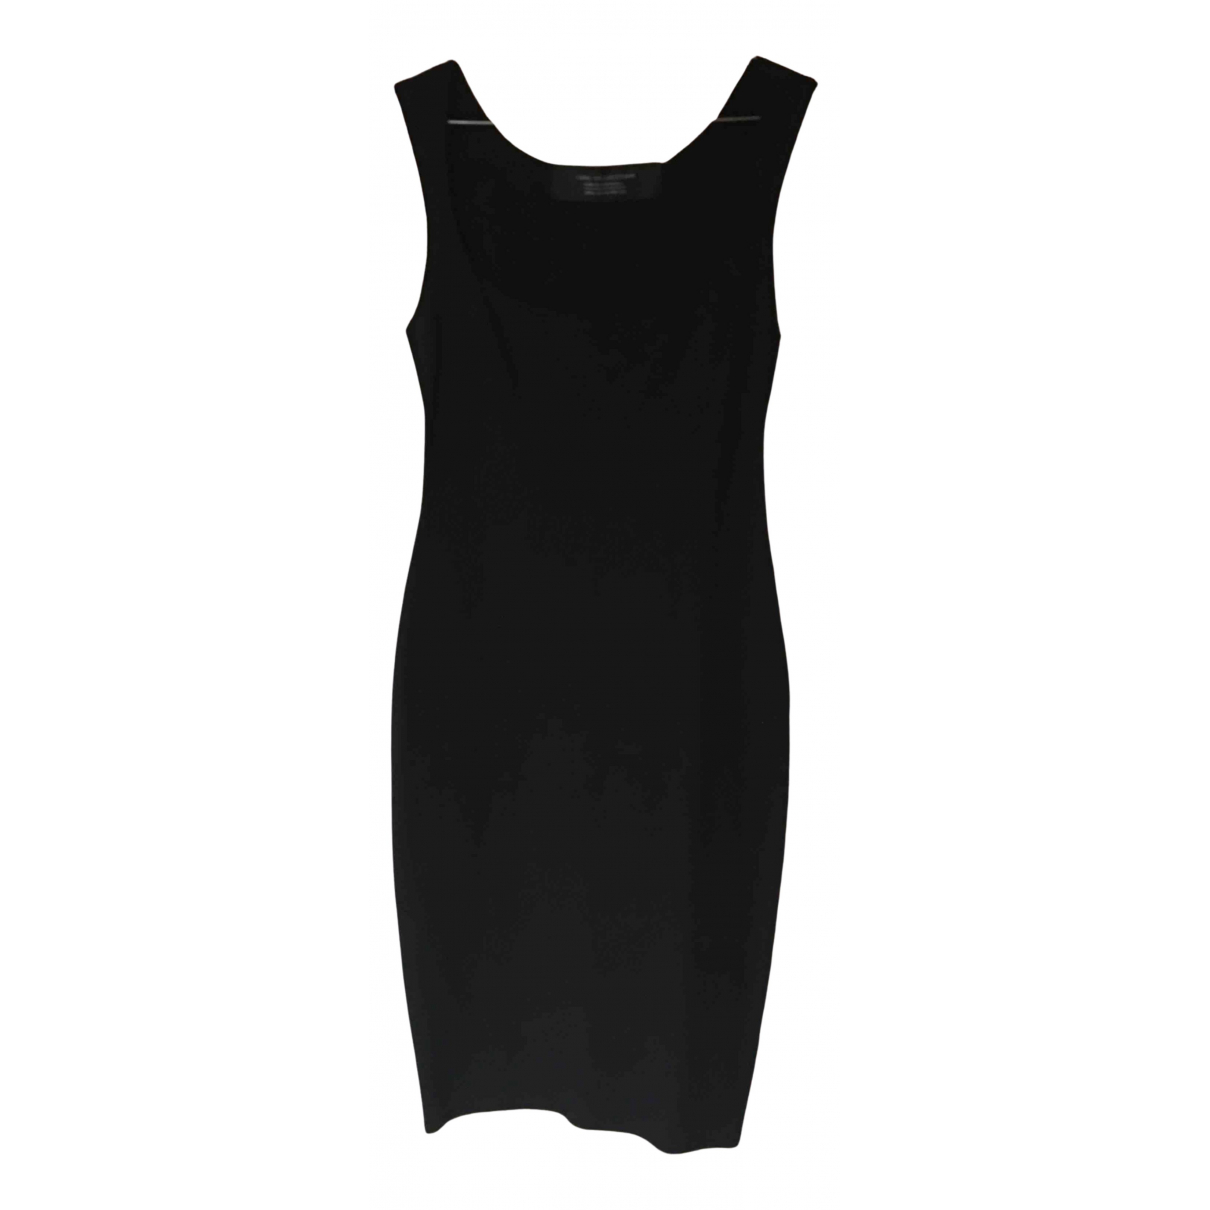 Zara N Black dress for Women M International